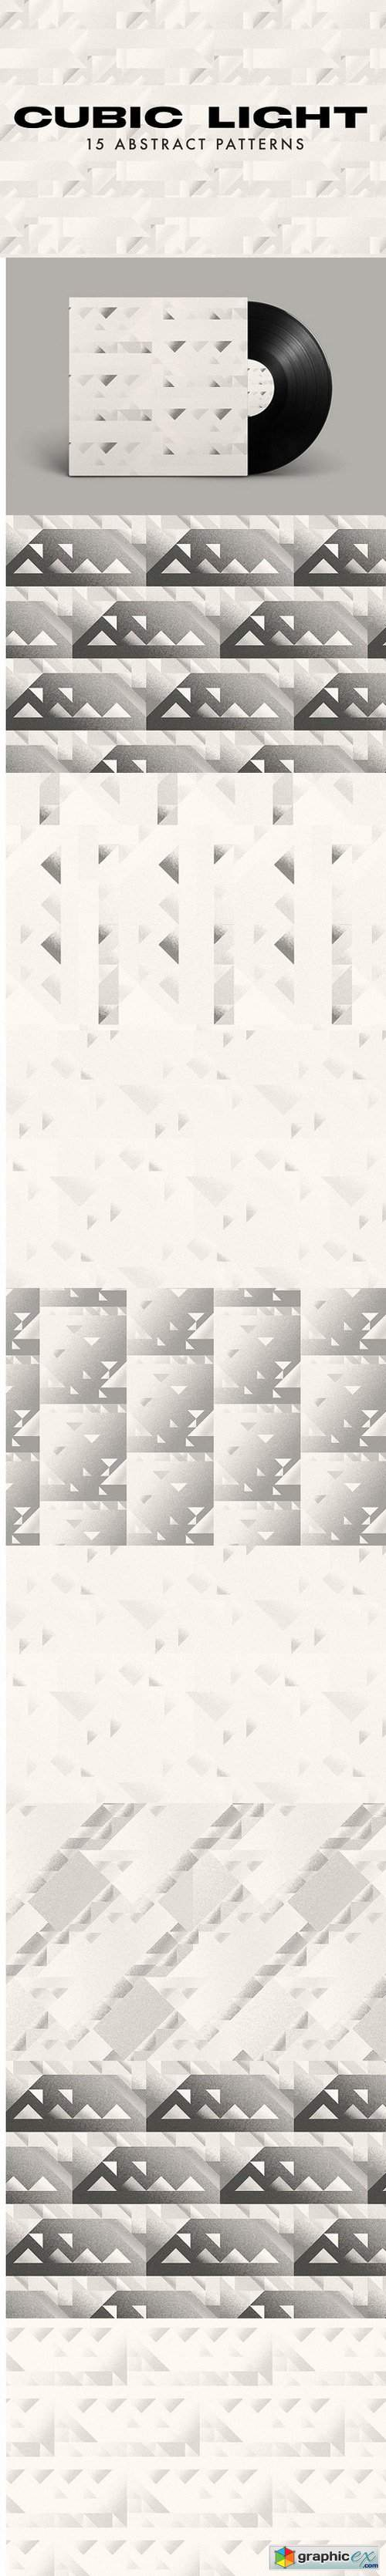 15 Cubic Seamless Patterns